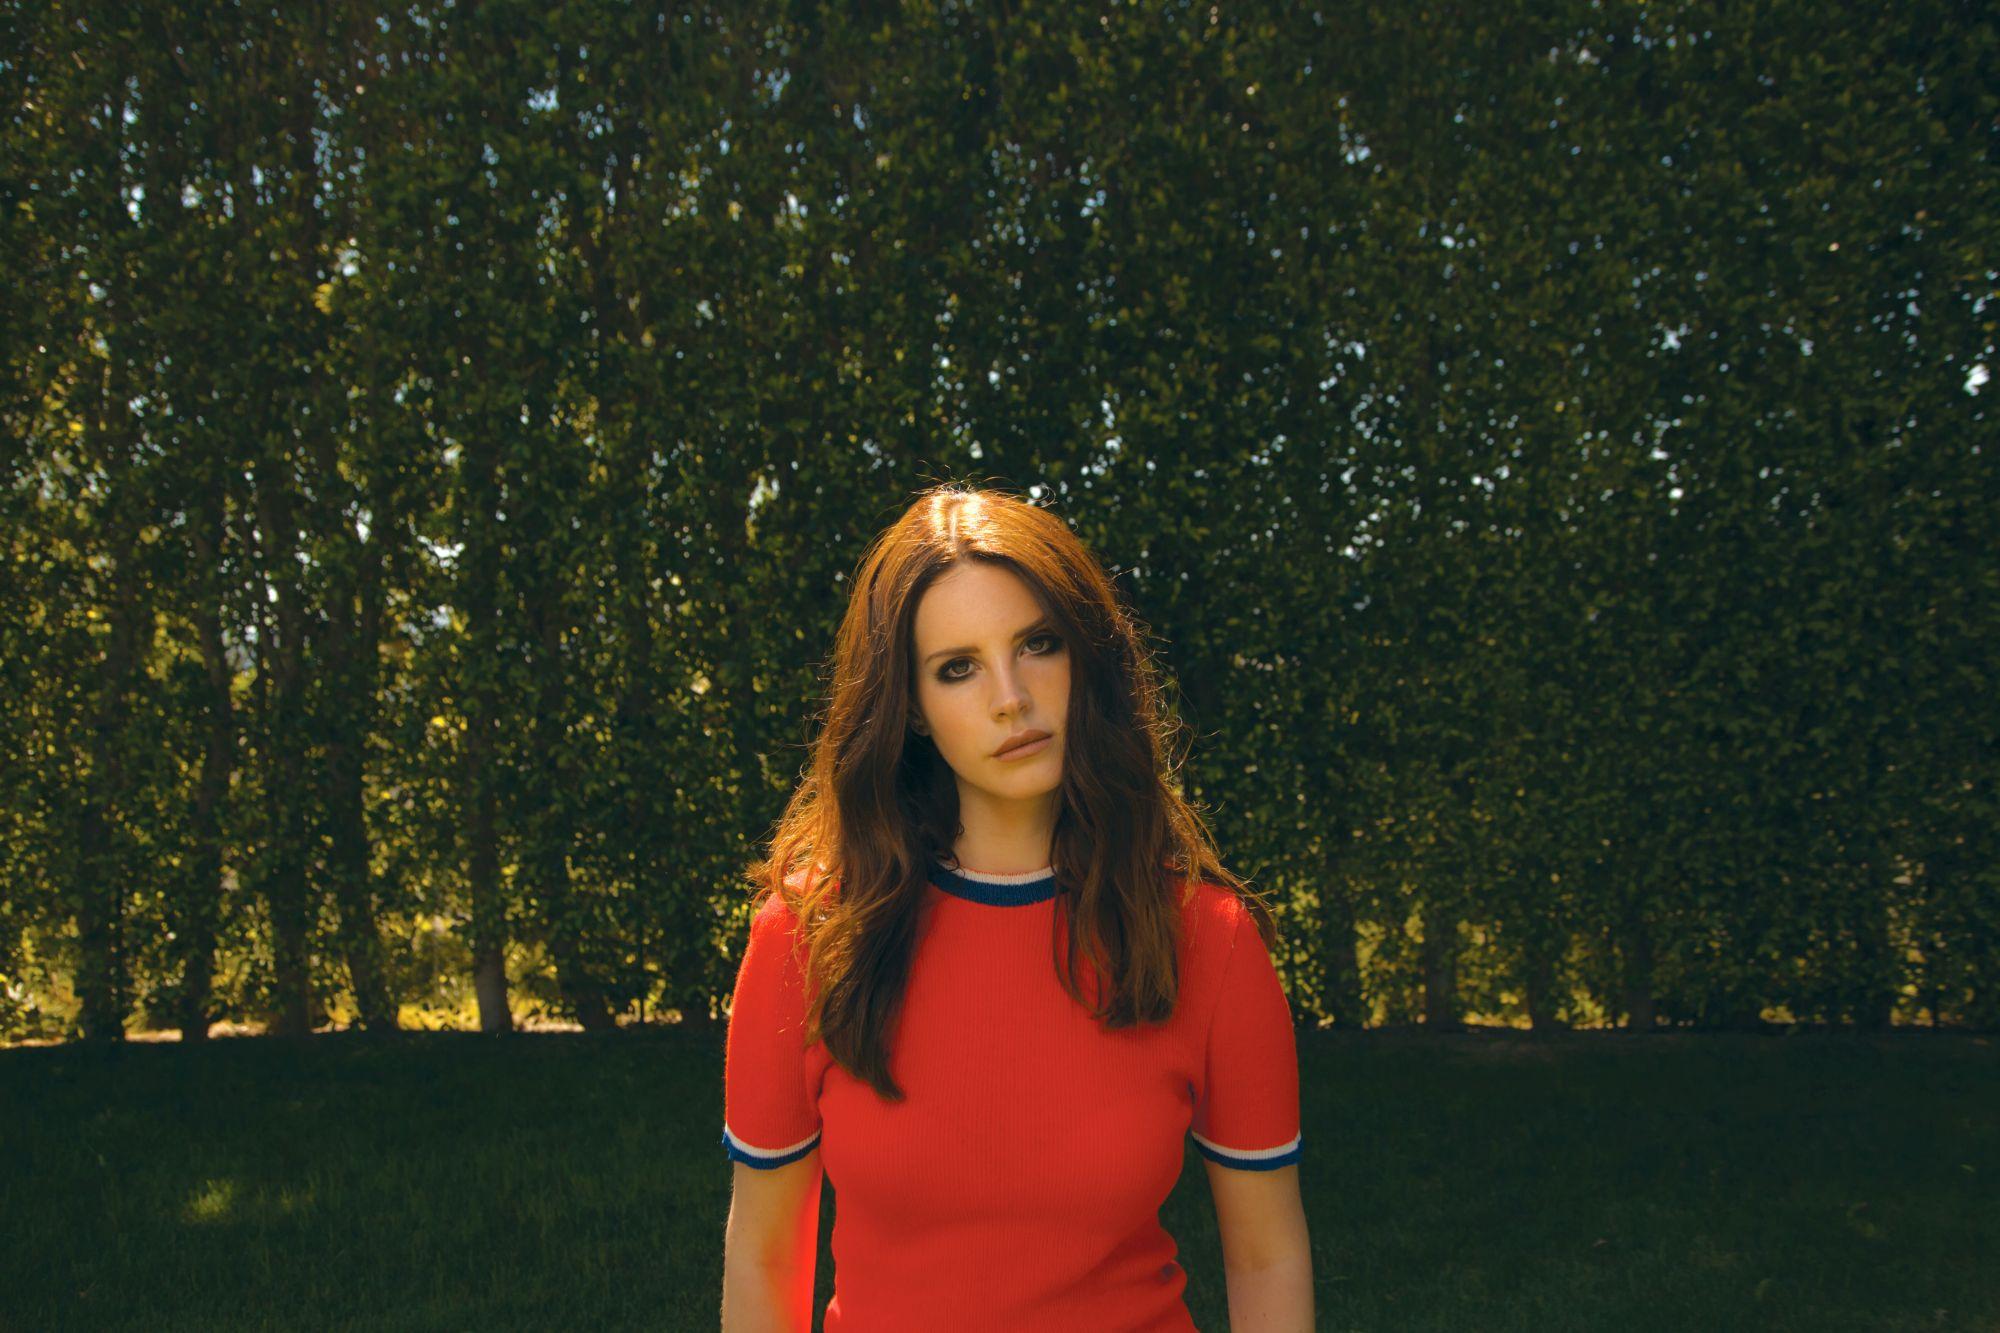 Pictures Of Lana Del Rey